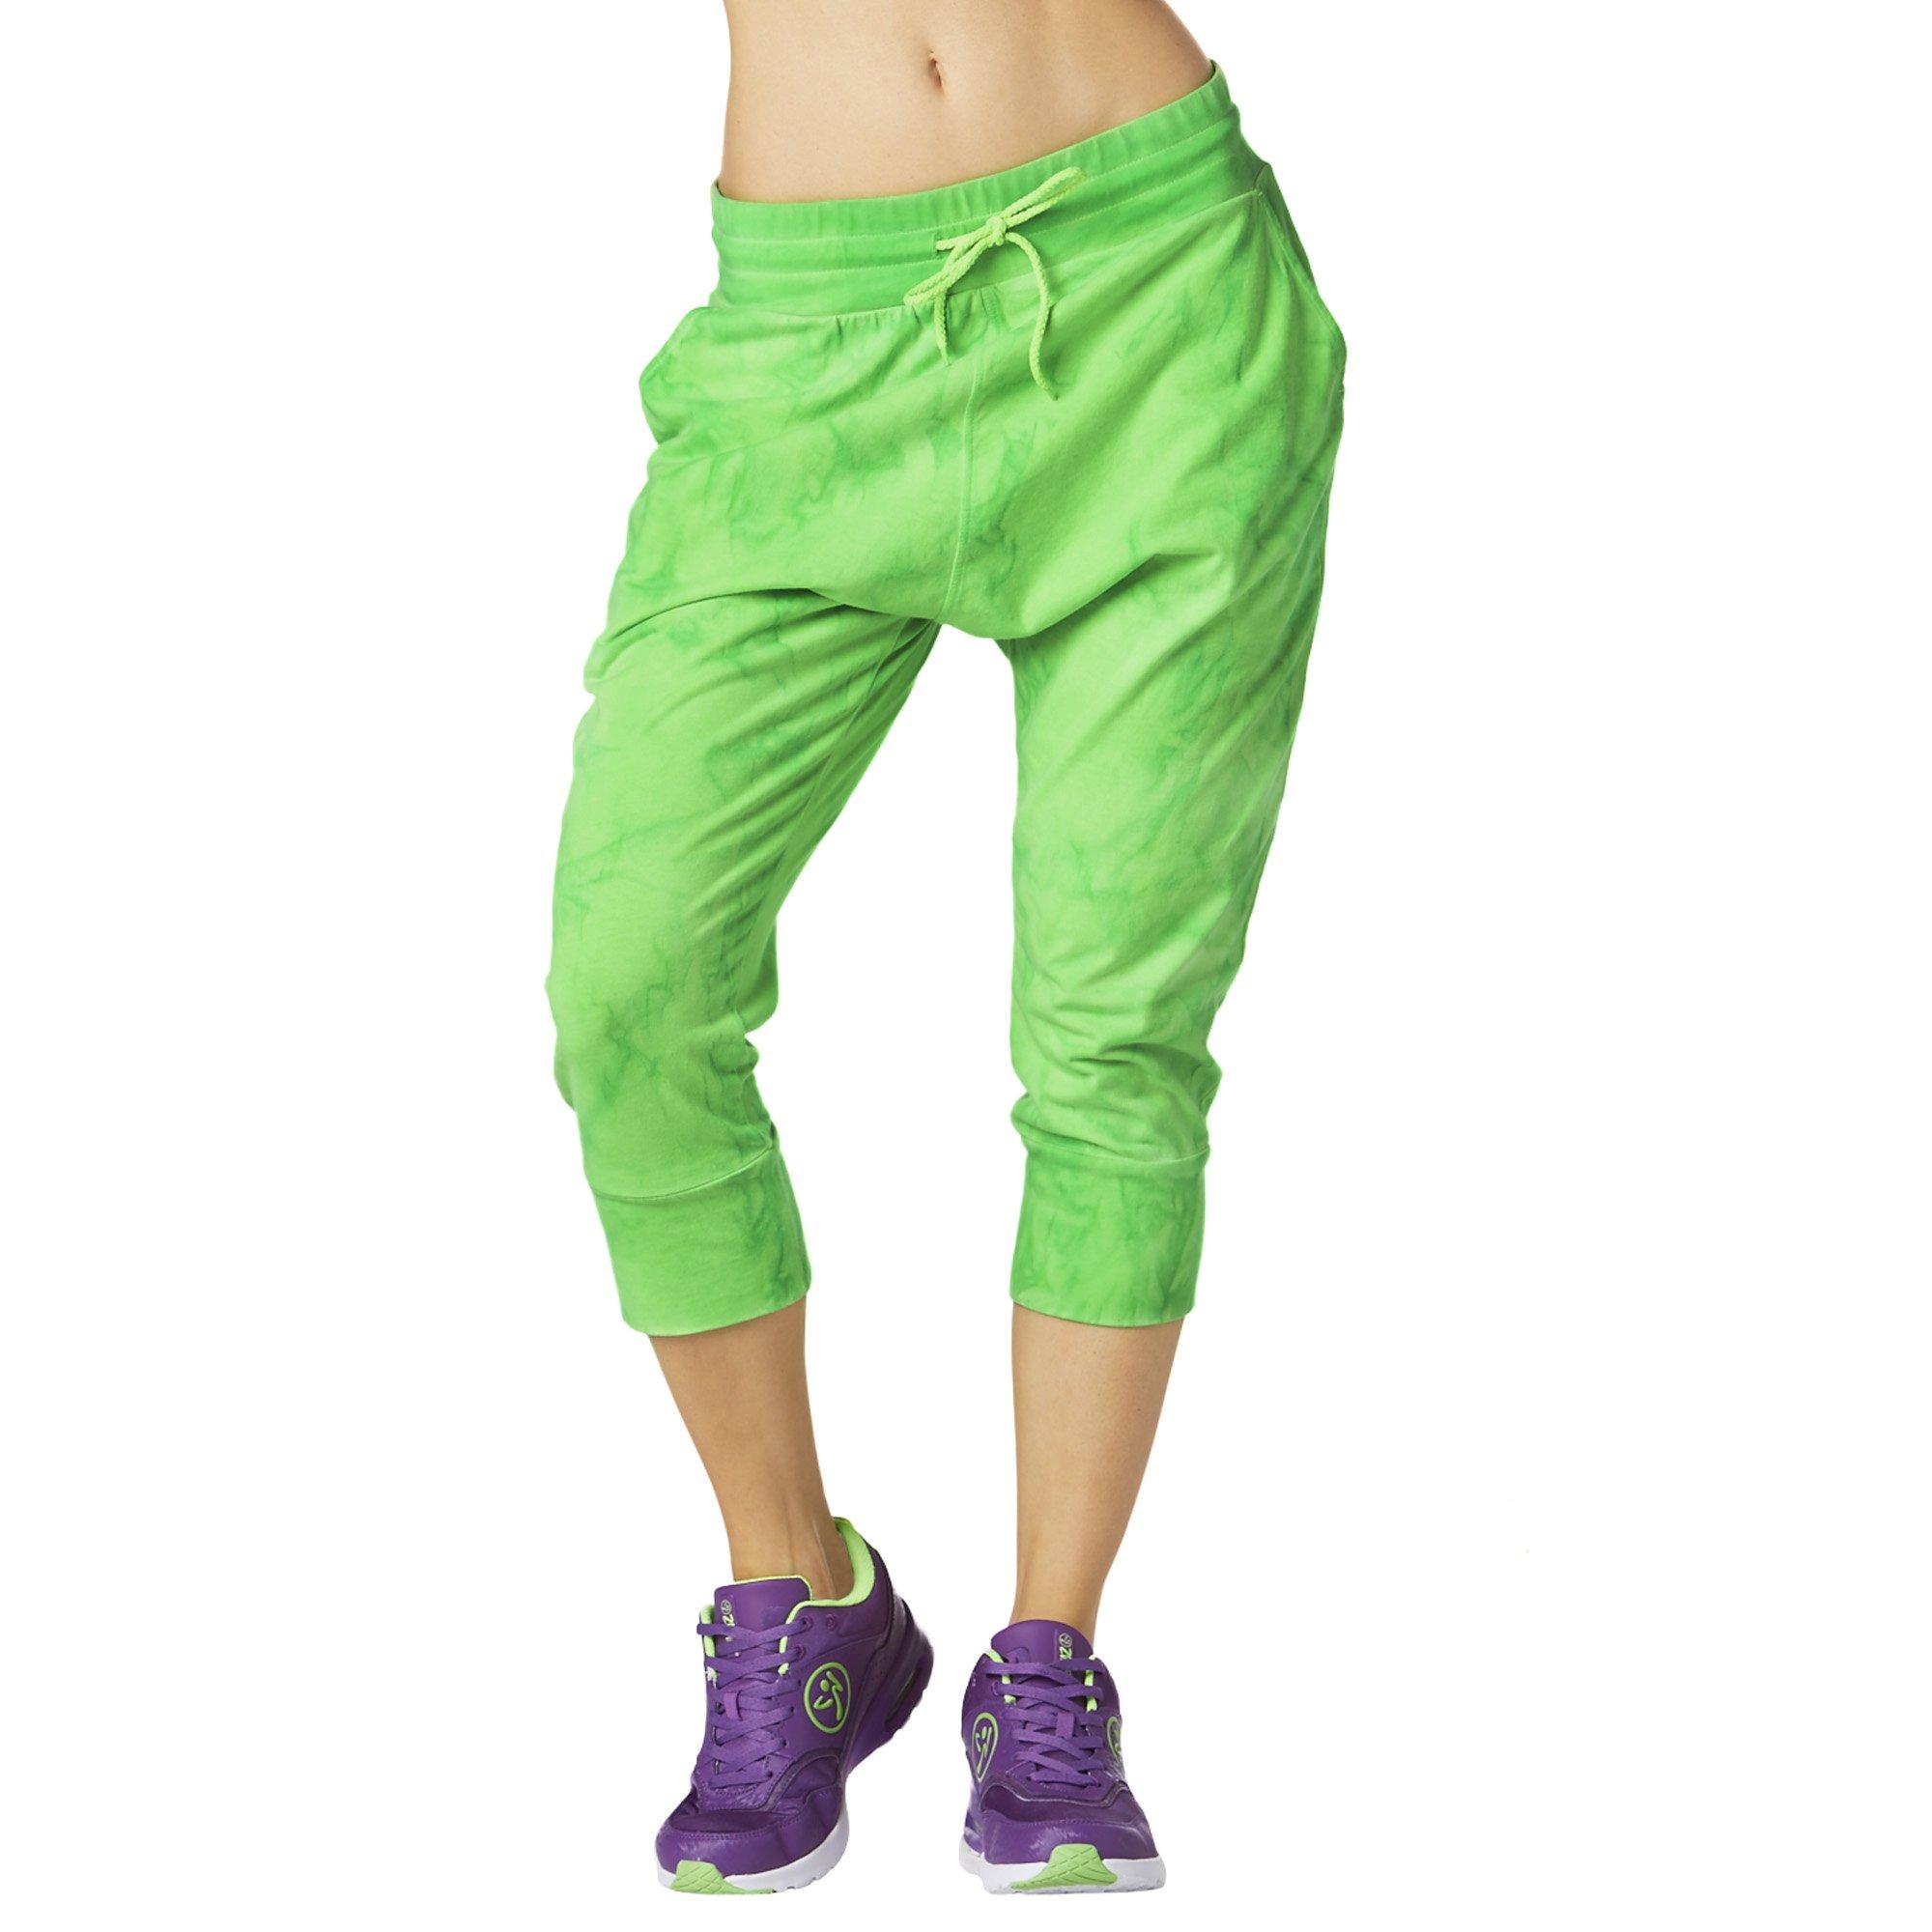 Zumba Women's Harem Capri Pants, Get in Lime, X-Small